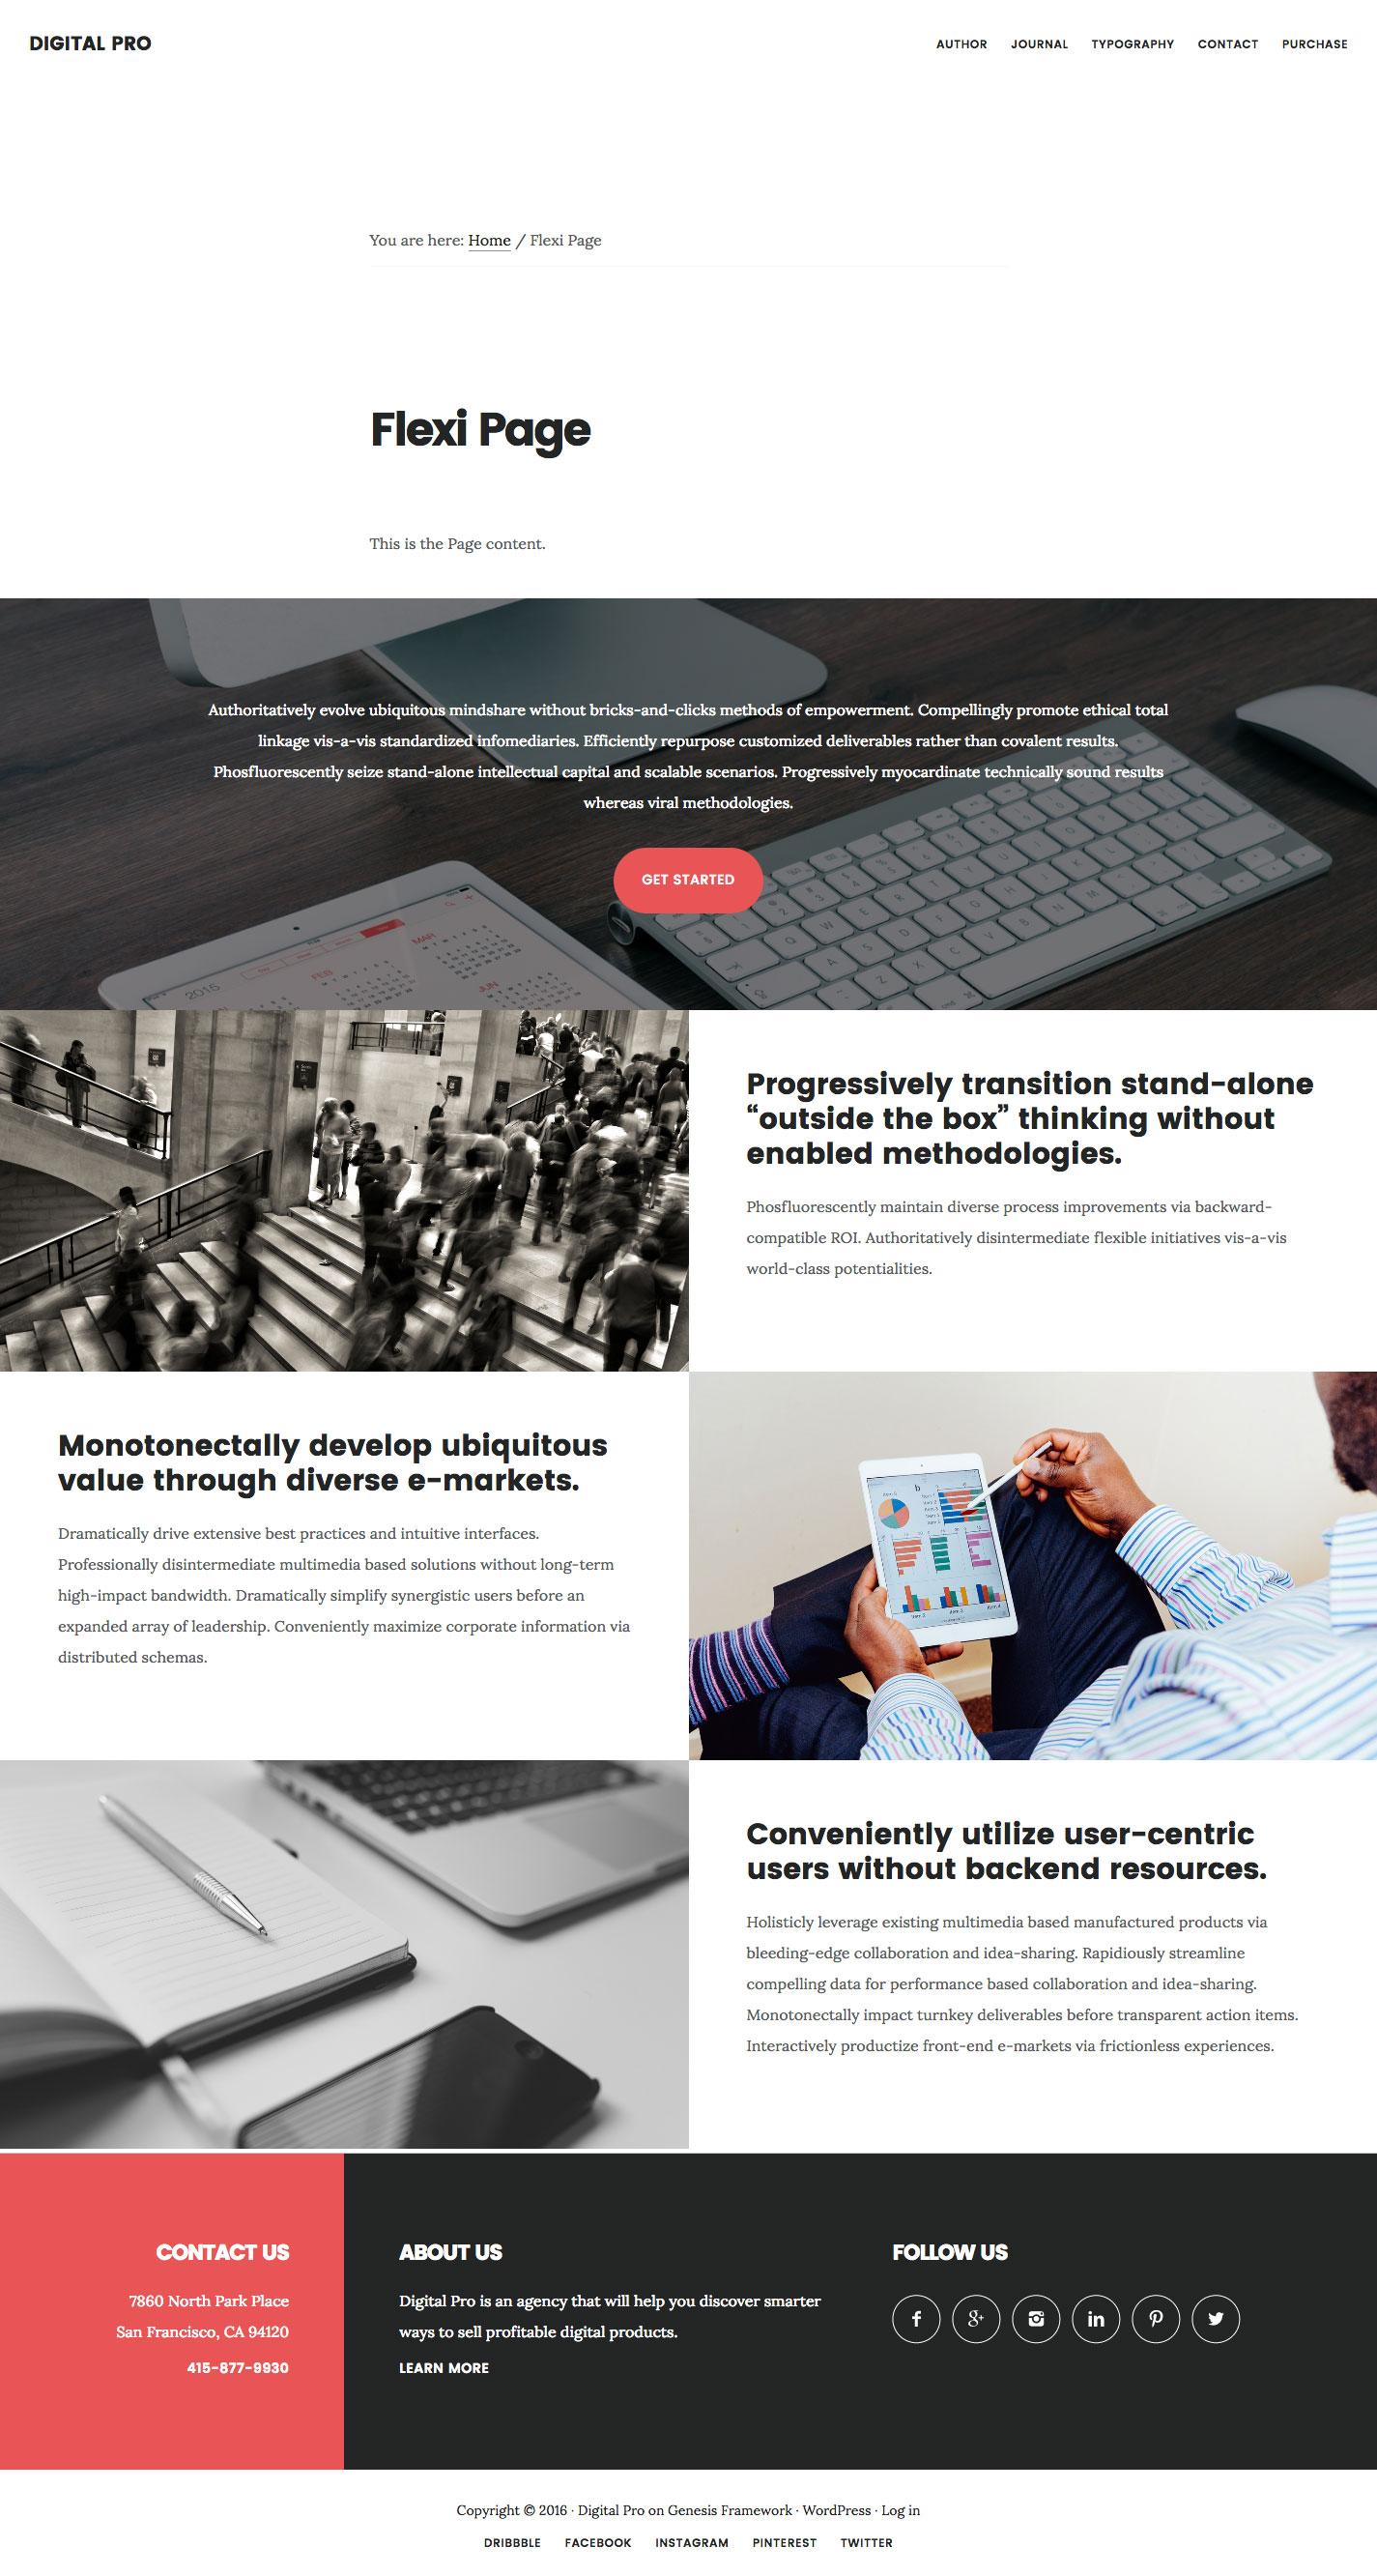 digital-pro-flexi-page